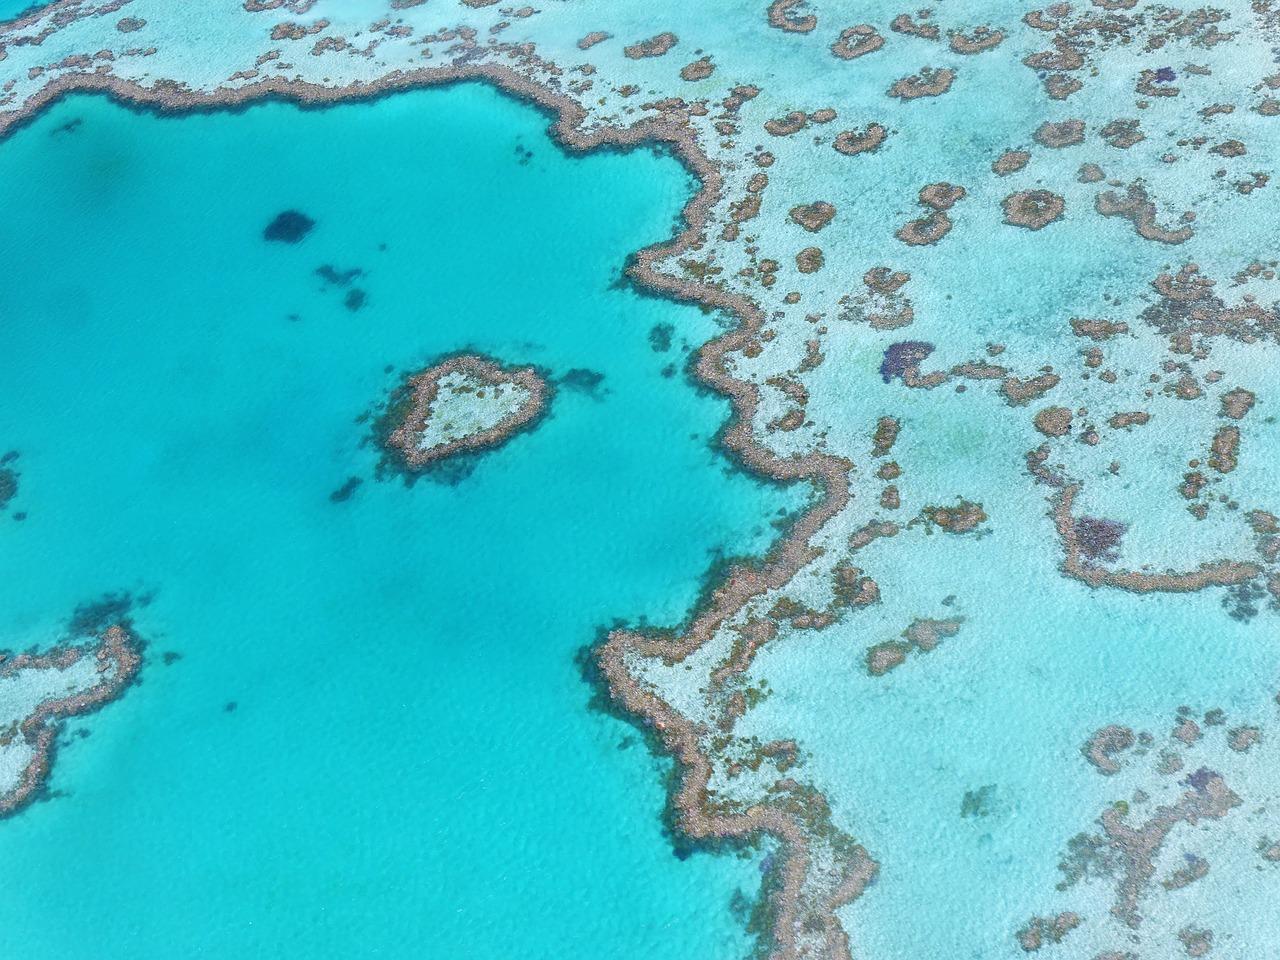 Overhead Photo of Heart Reef, Great Barrier Reef